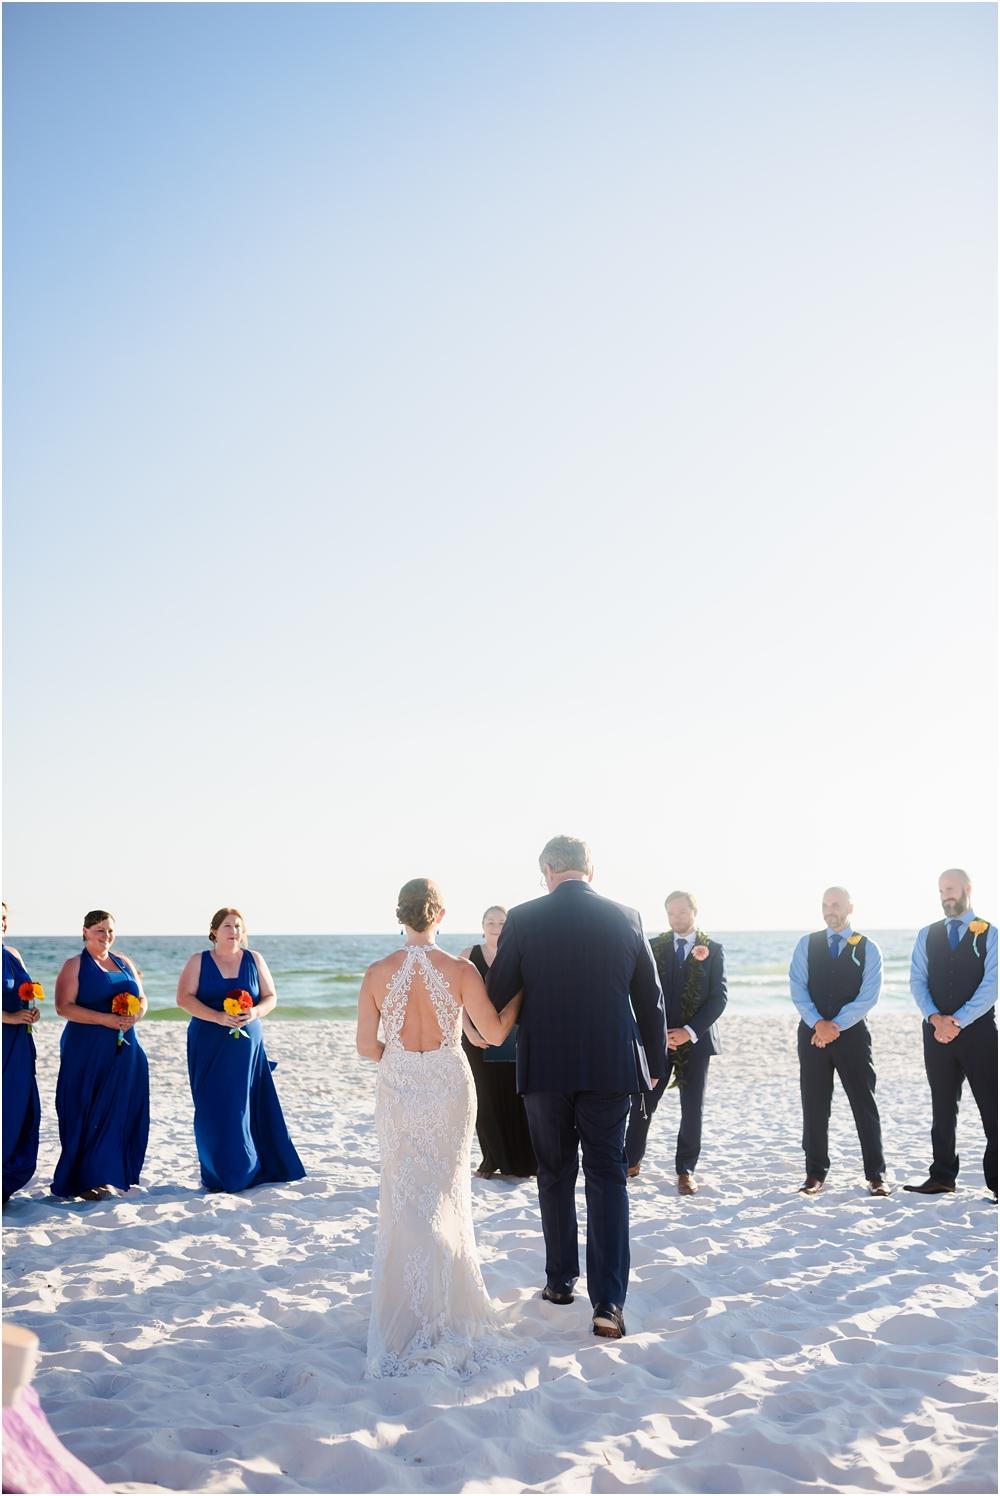 ledman-wedding-kiersten-stevenson-photography-30a-panama-city-beach-dothan-tallahassee-(196-of-763).JPG